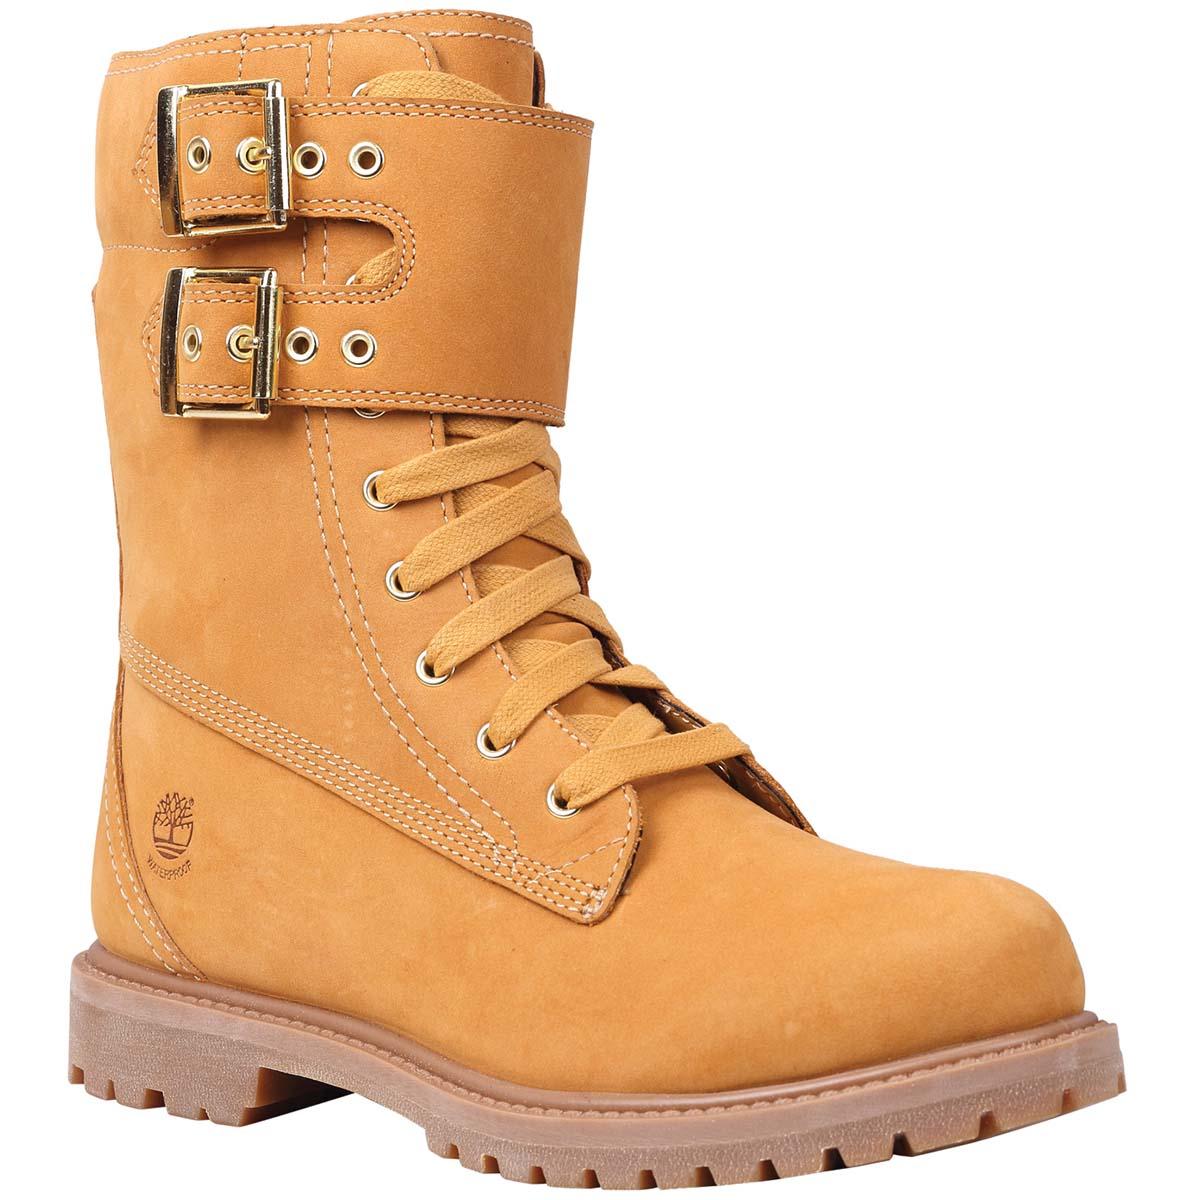 Colibrí Estudiante Racionalización  timberland boots with straps, OFF 75%,Latest trends!